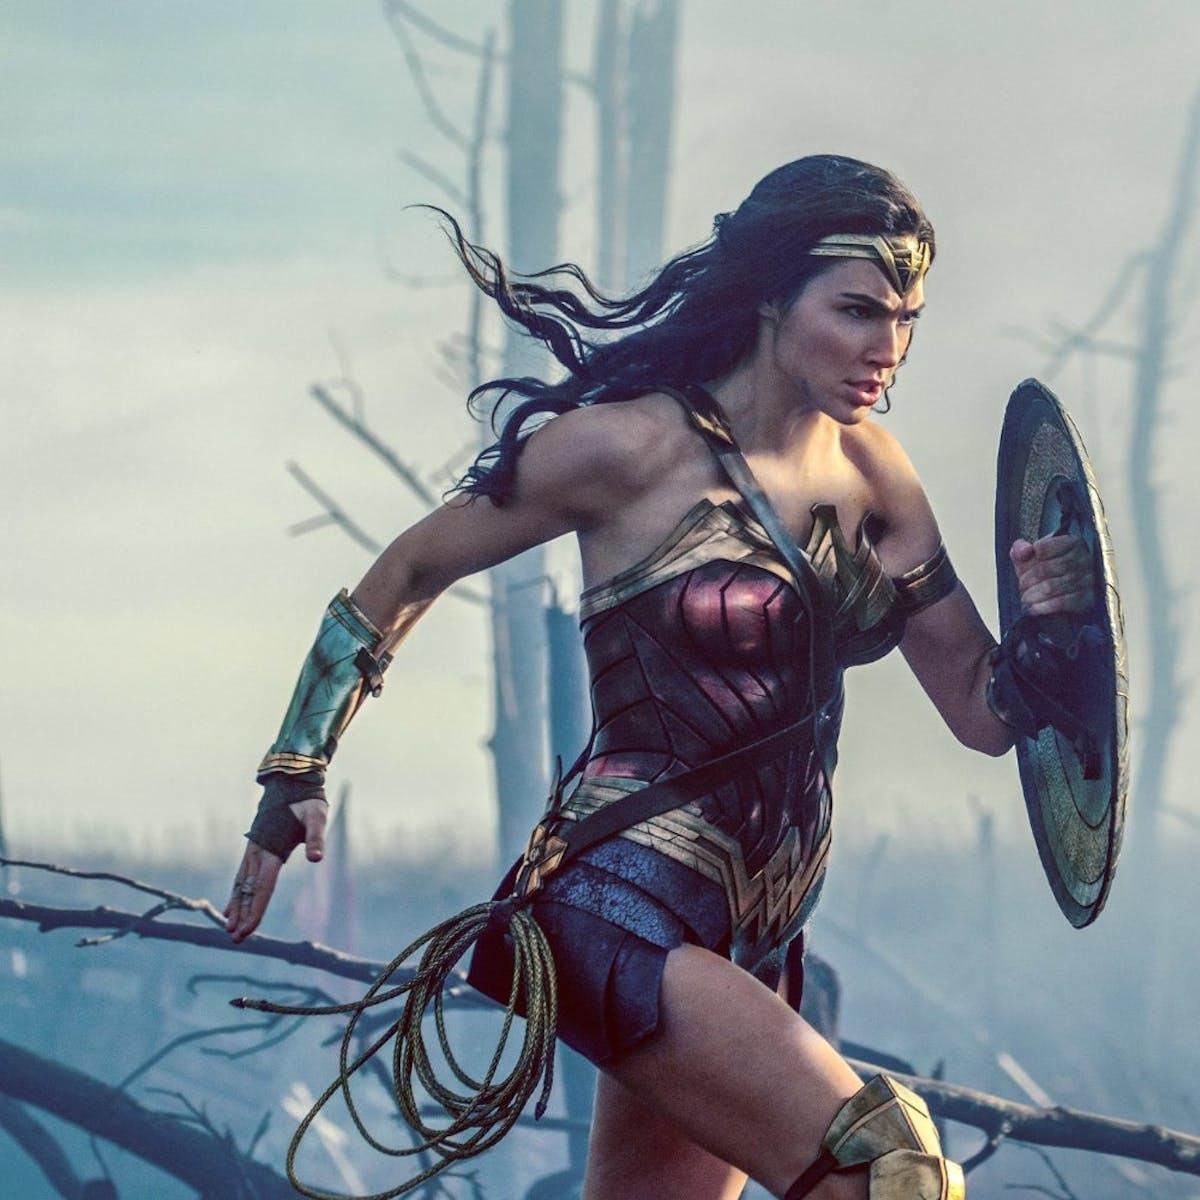 Review Wonder Woman Reinvigorates Tired Superhero Conventions